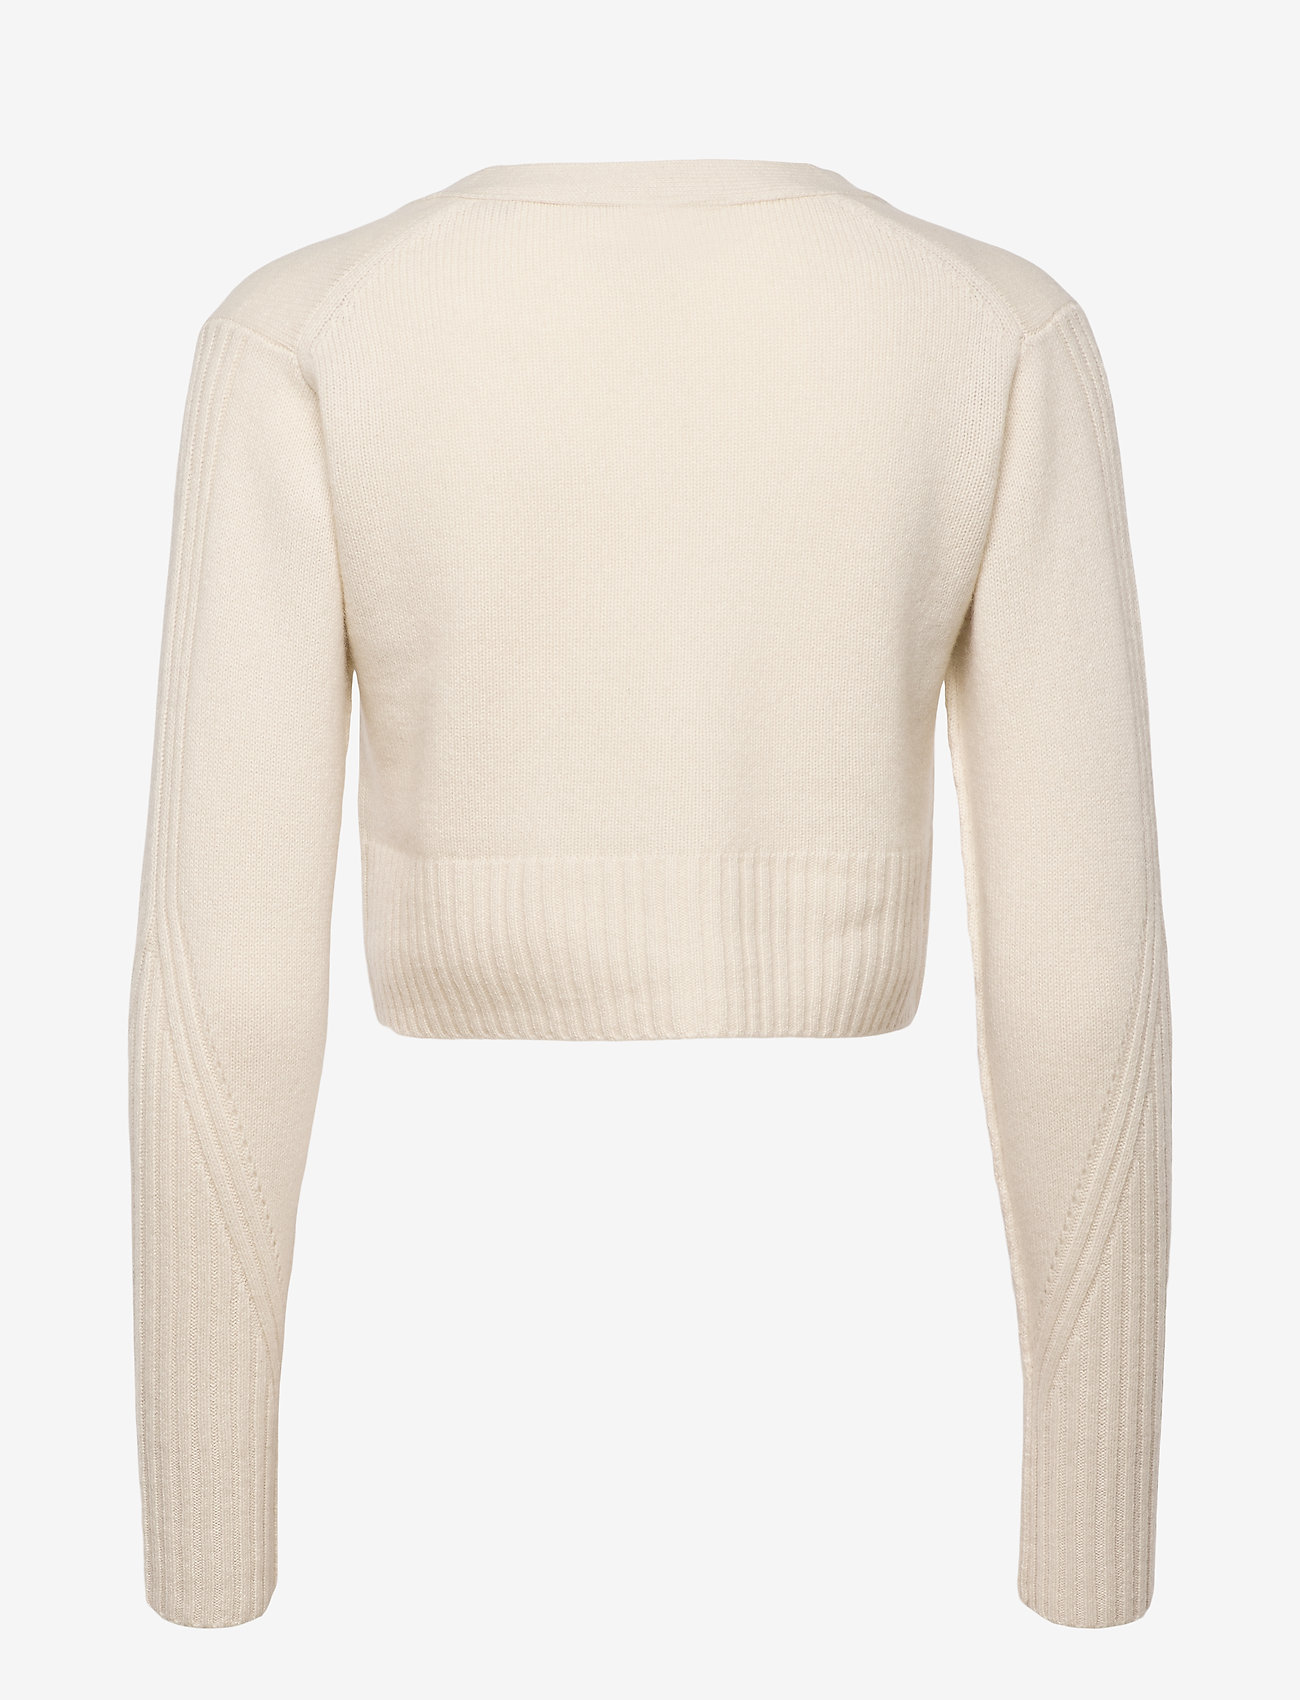 AllSaints - DREW CASHMERE CARDIG - gilets - ivory white - 1